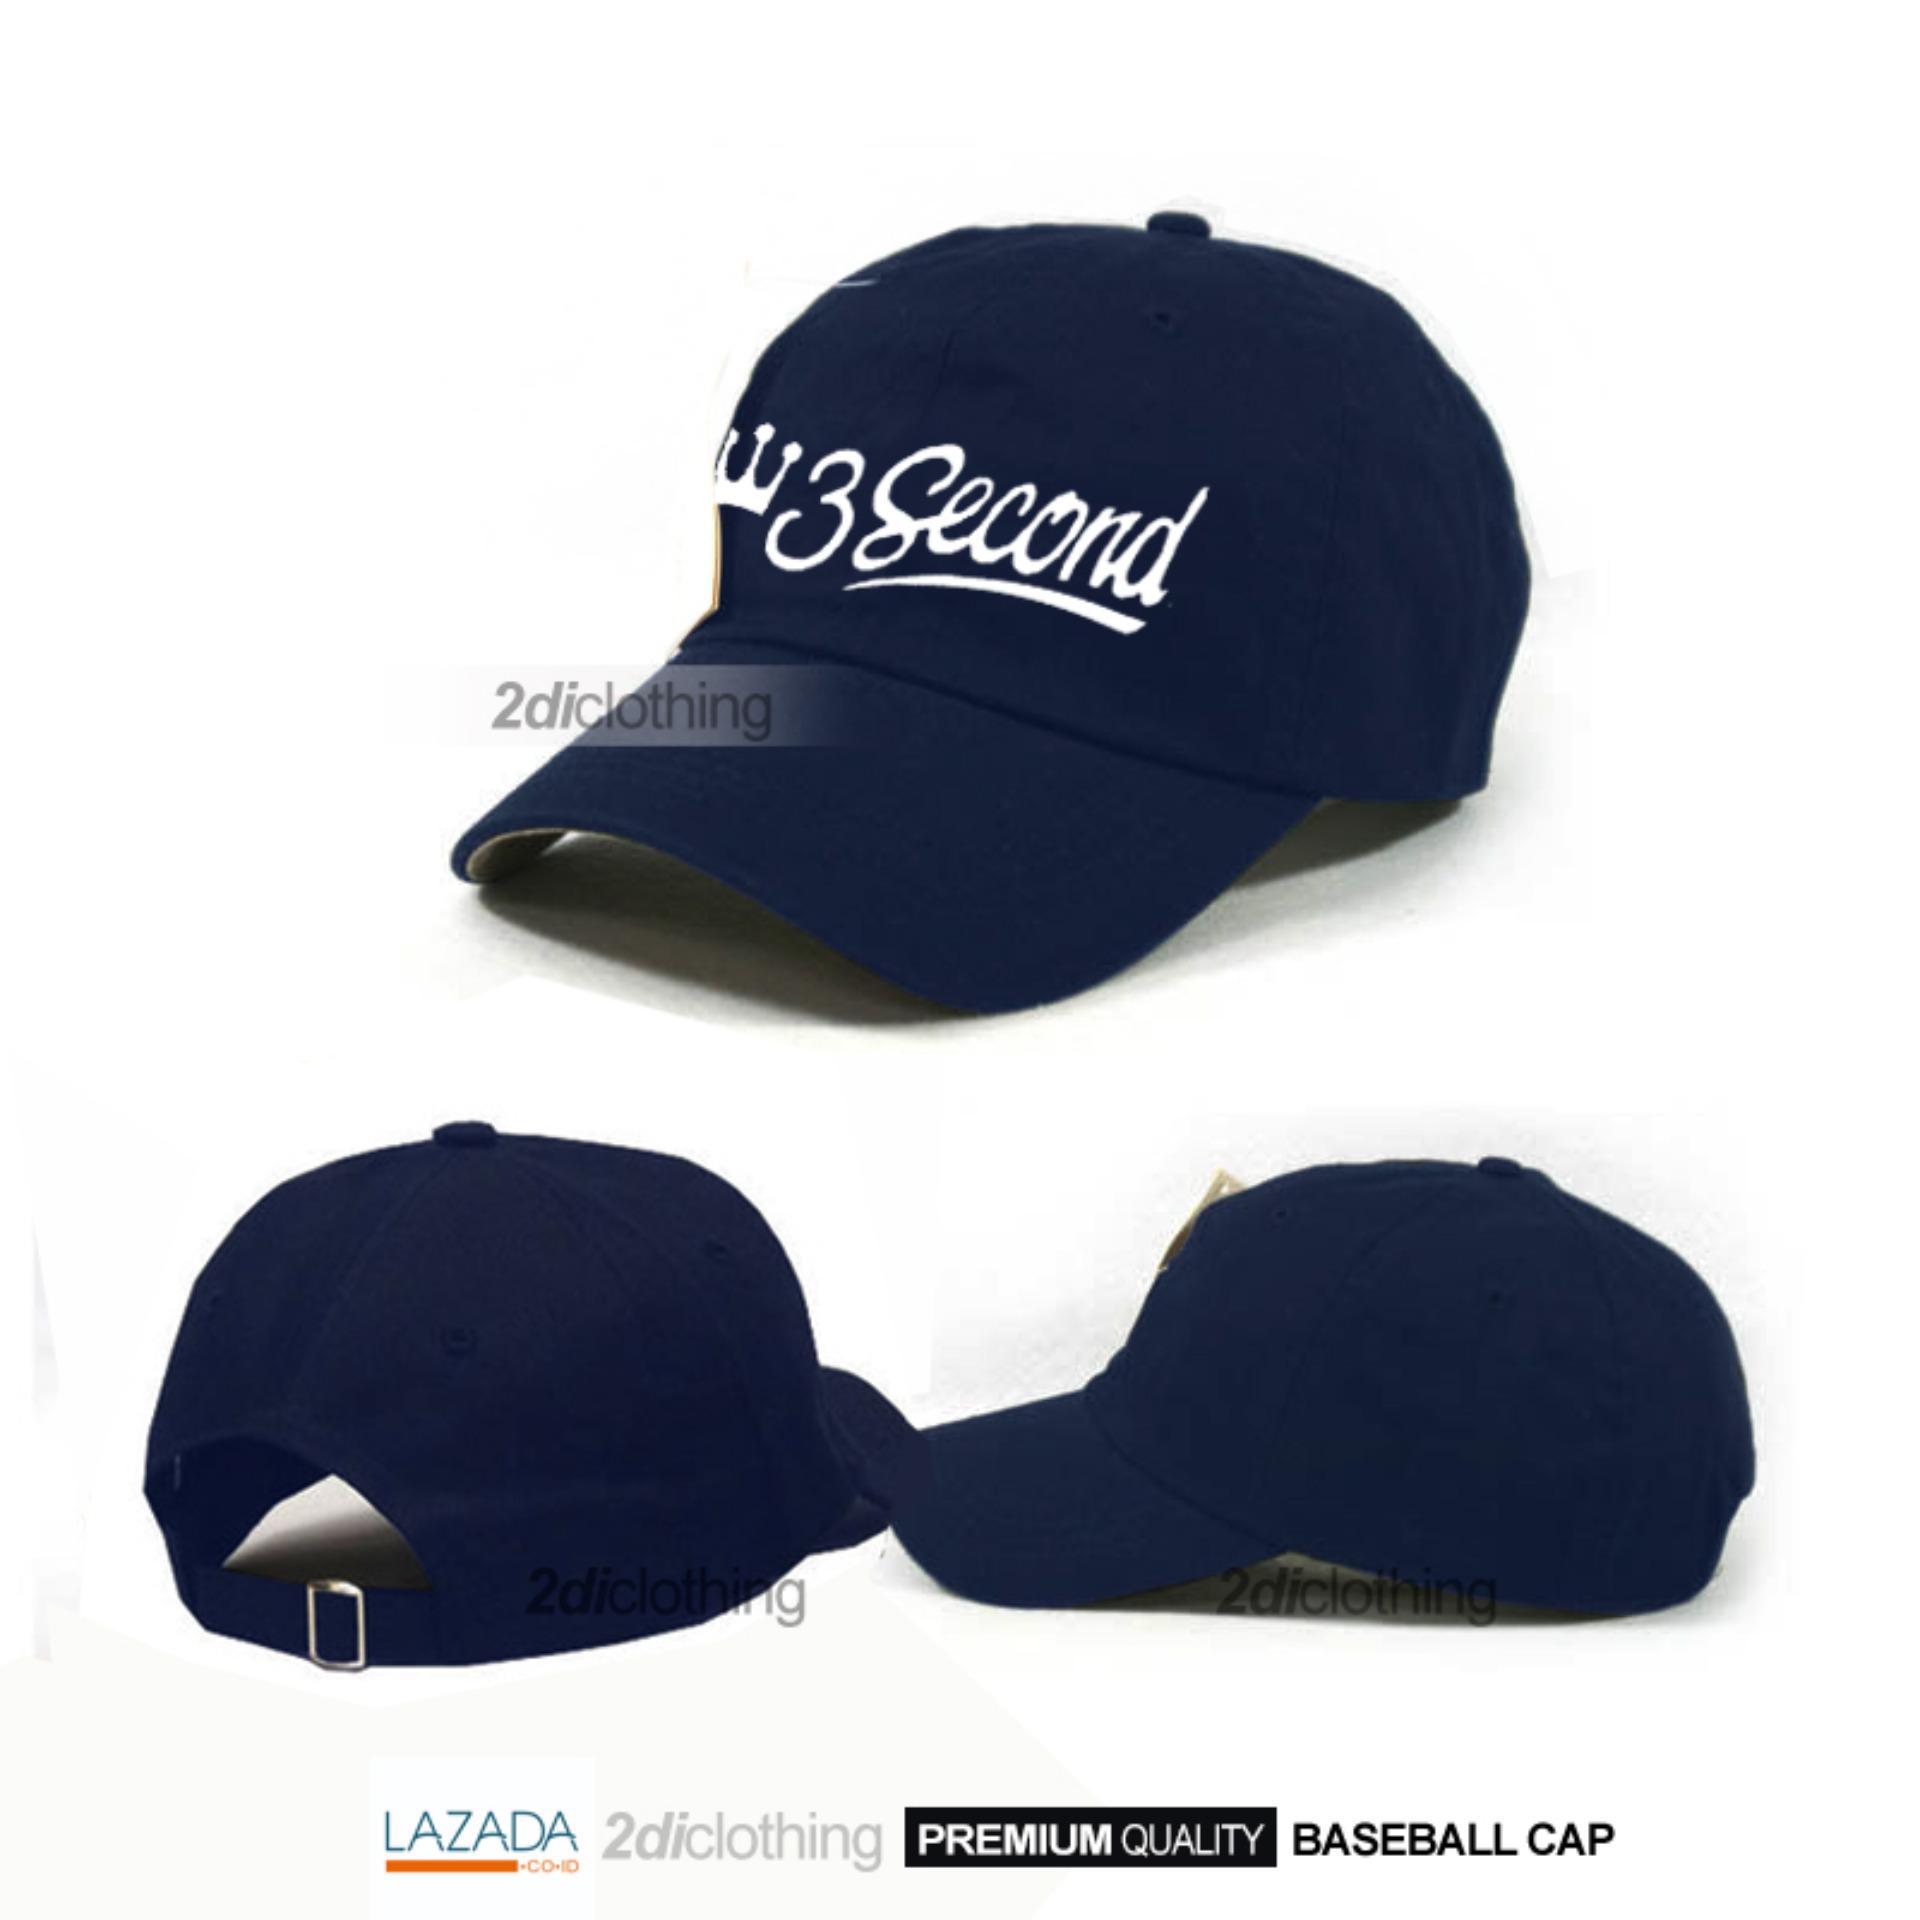 Topi baseball cap 3second navy premium